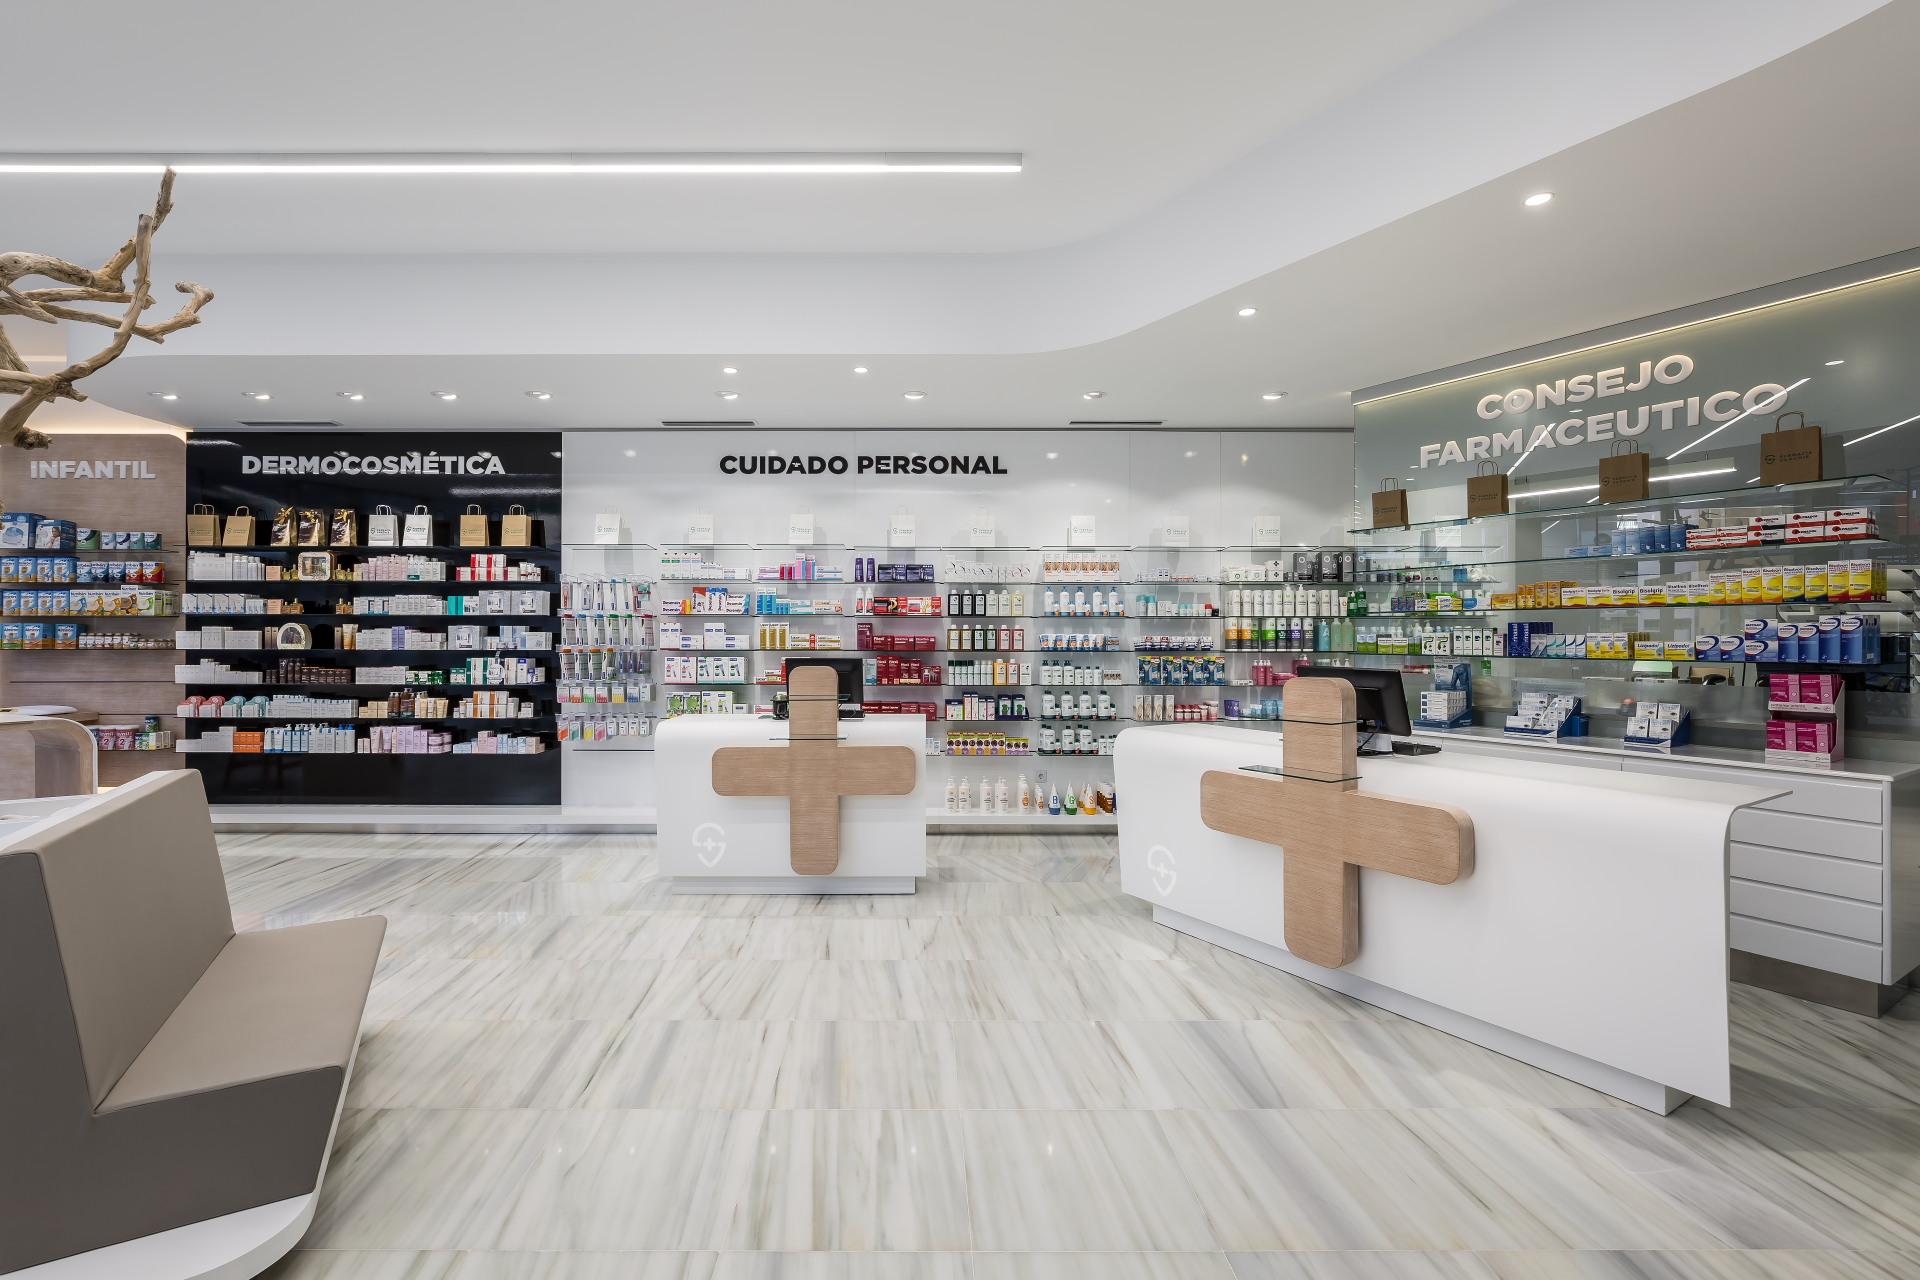 fotografia-arquitectura-valencia-german-cabo-d'estudio-farmacia-sanchis-ribarroja (16)